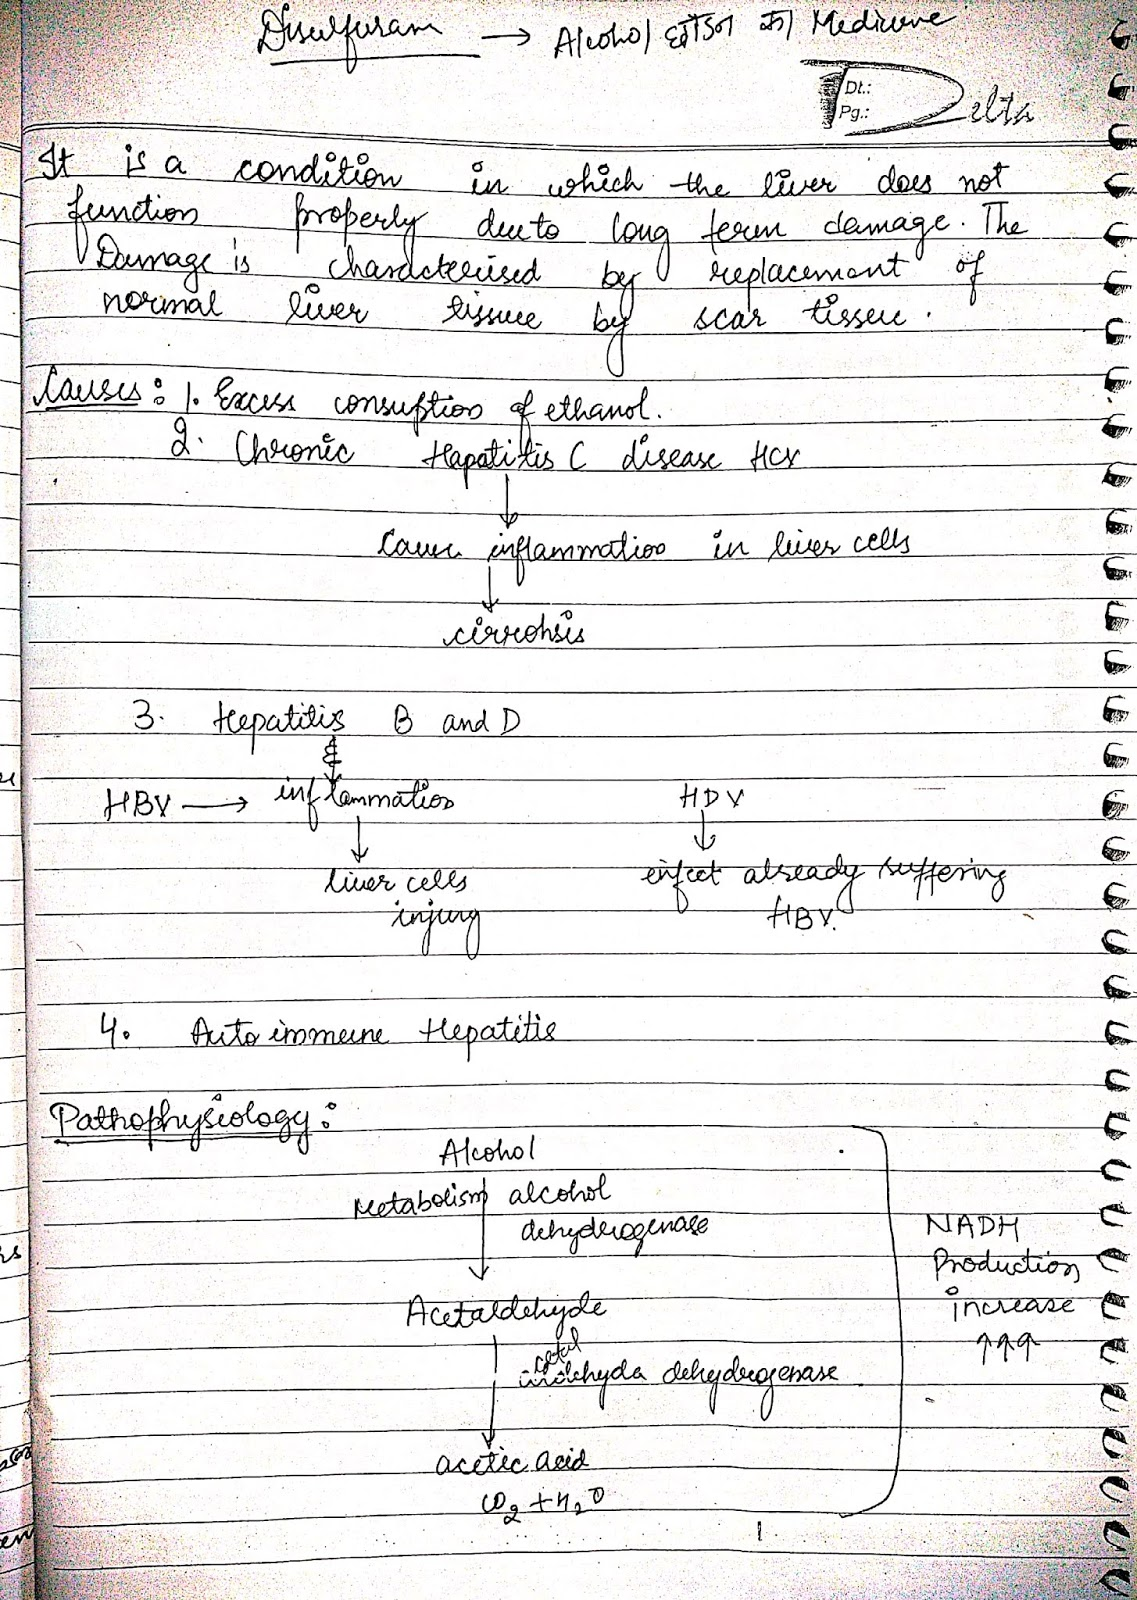 pathophysiology - alcohol liver cirrhosis